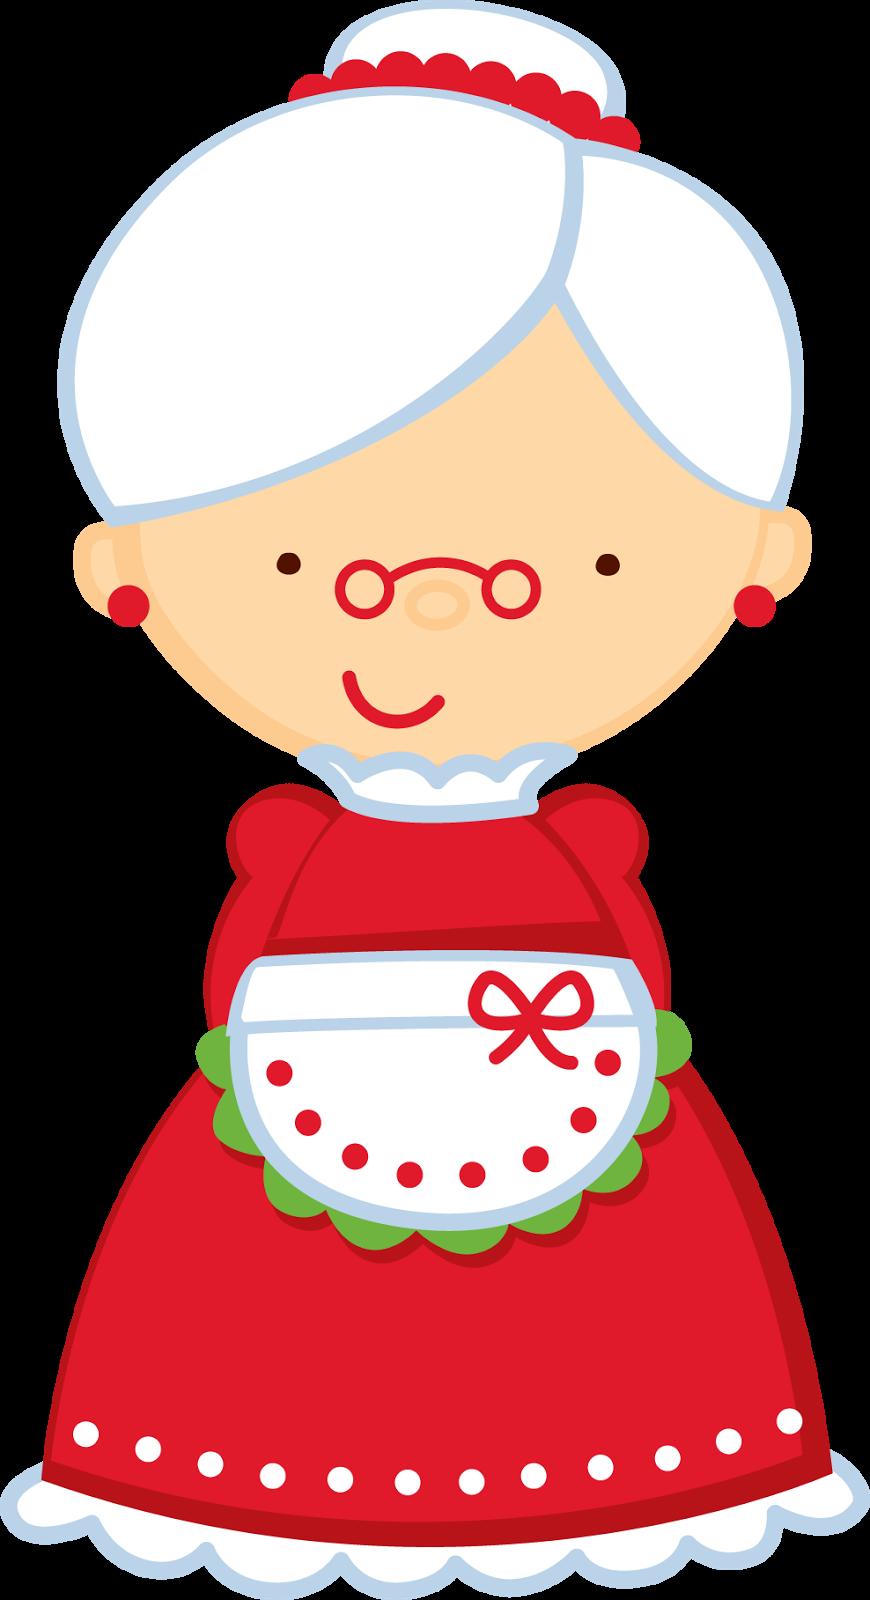 Christmas tag clipart freeuse stock Passatempo da Ana: Imagens Natalinas | My Silhouette | Pinterest ... freeuse stock